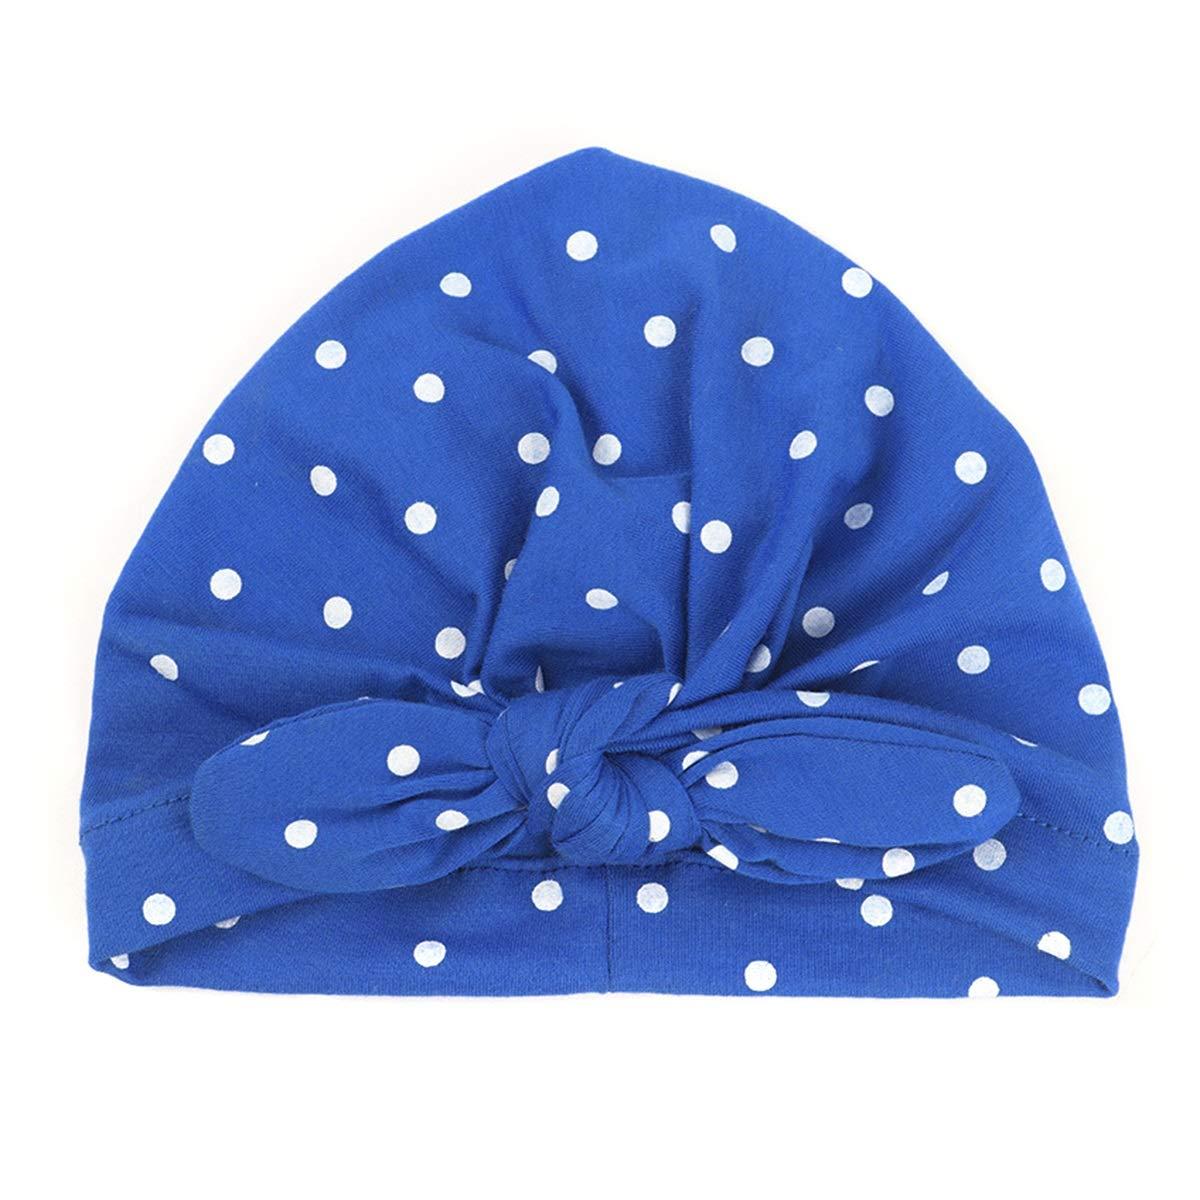 puseky Infant Toddler Baby Girls Tie Bowknot Indian Hat Kids Polka Dot Print Rabbit Ear Beanie Cap